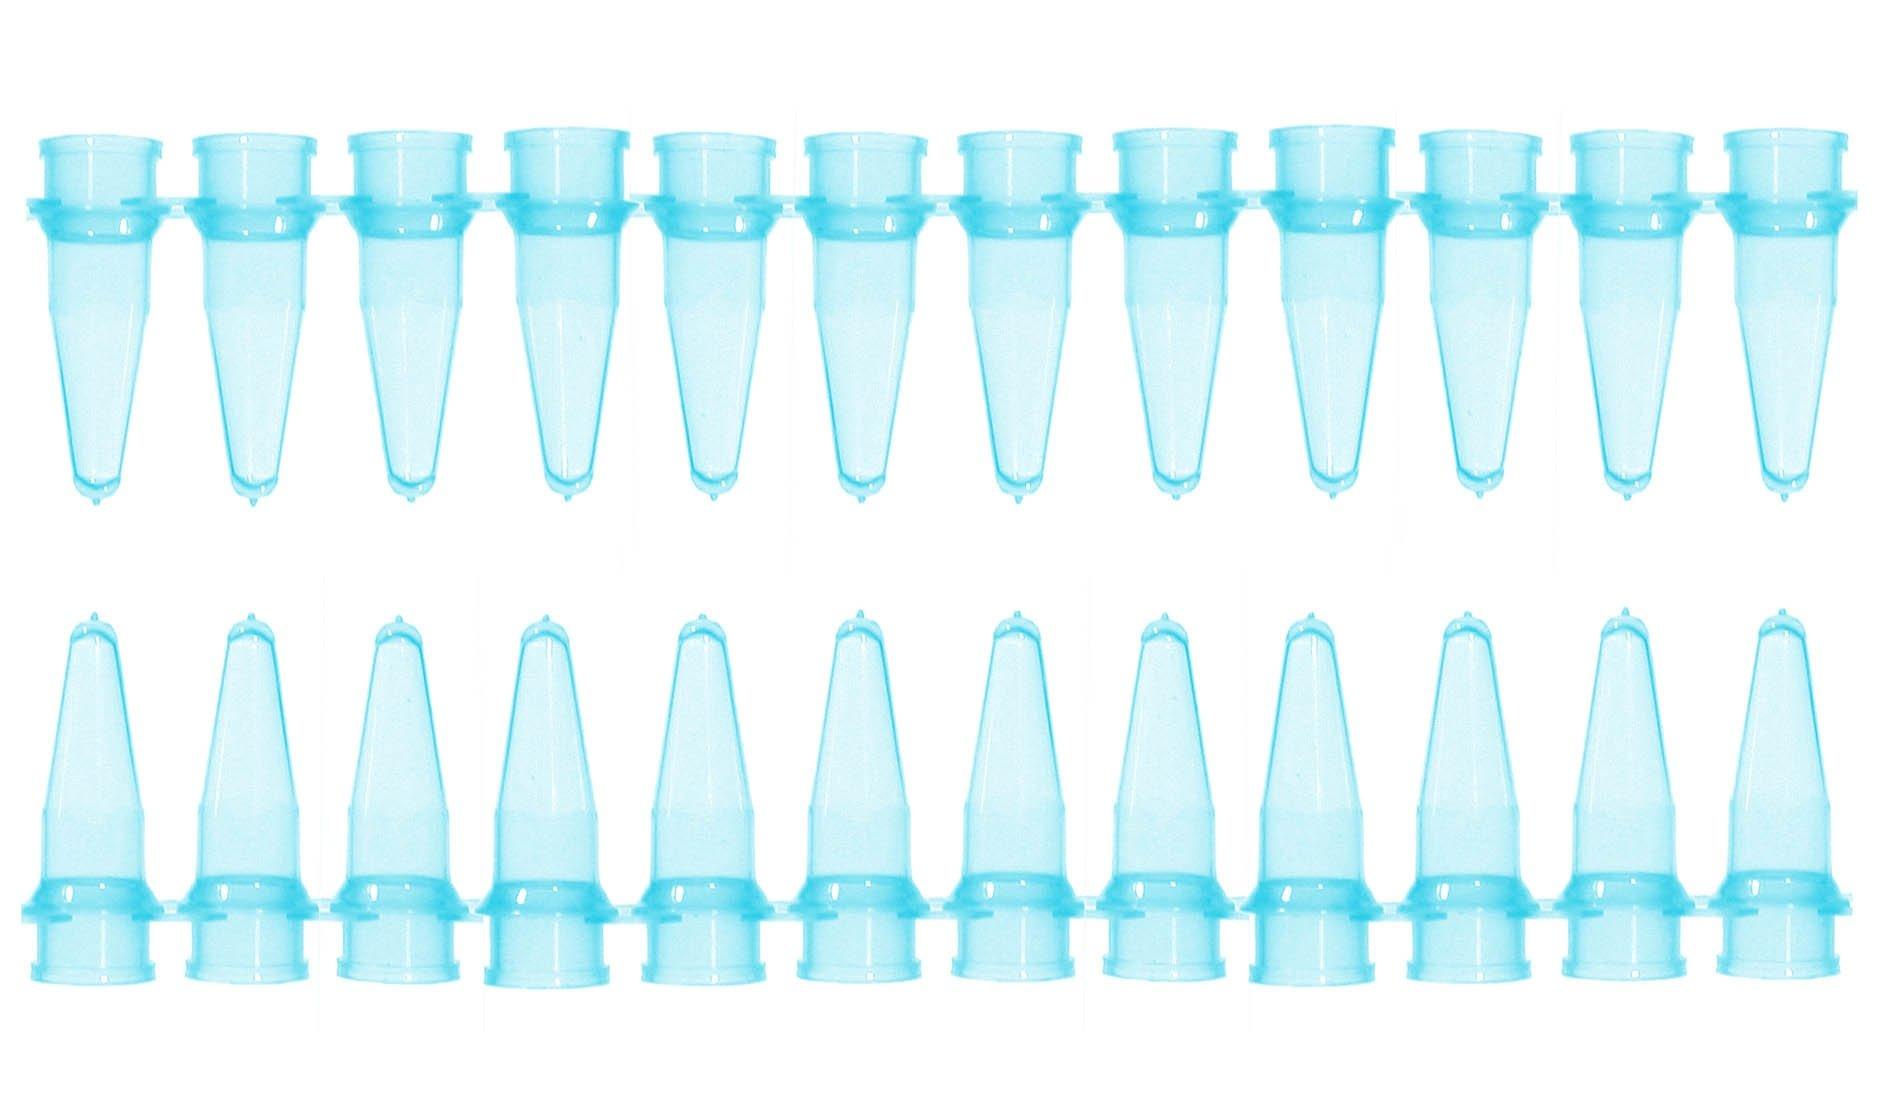 0.2mL Thin Wall Micro Tube - 12 Tubes/Strip - Blue (Pack of 100)